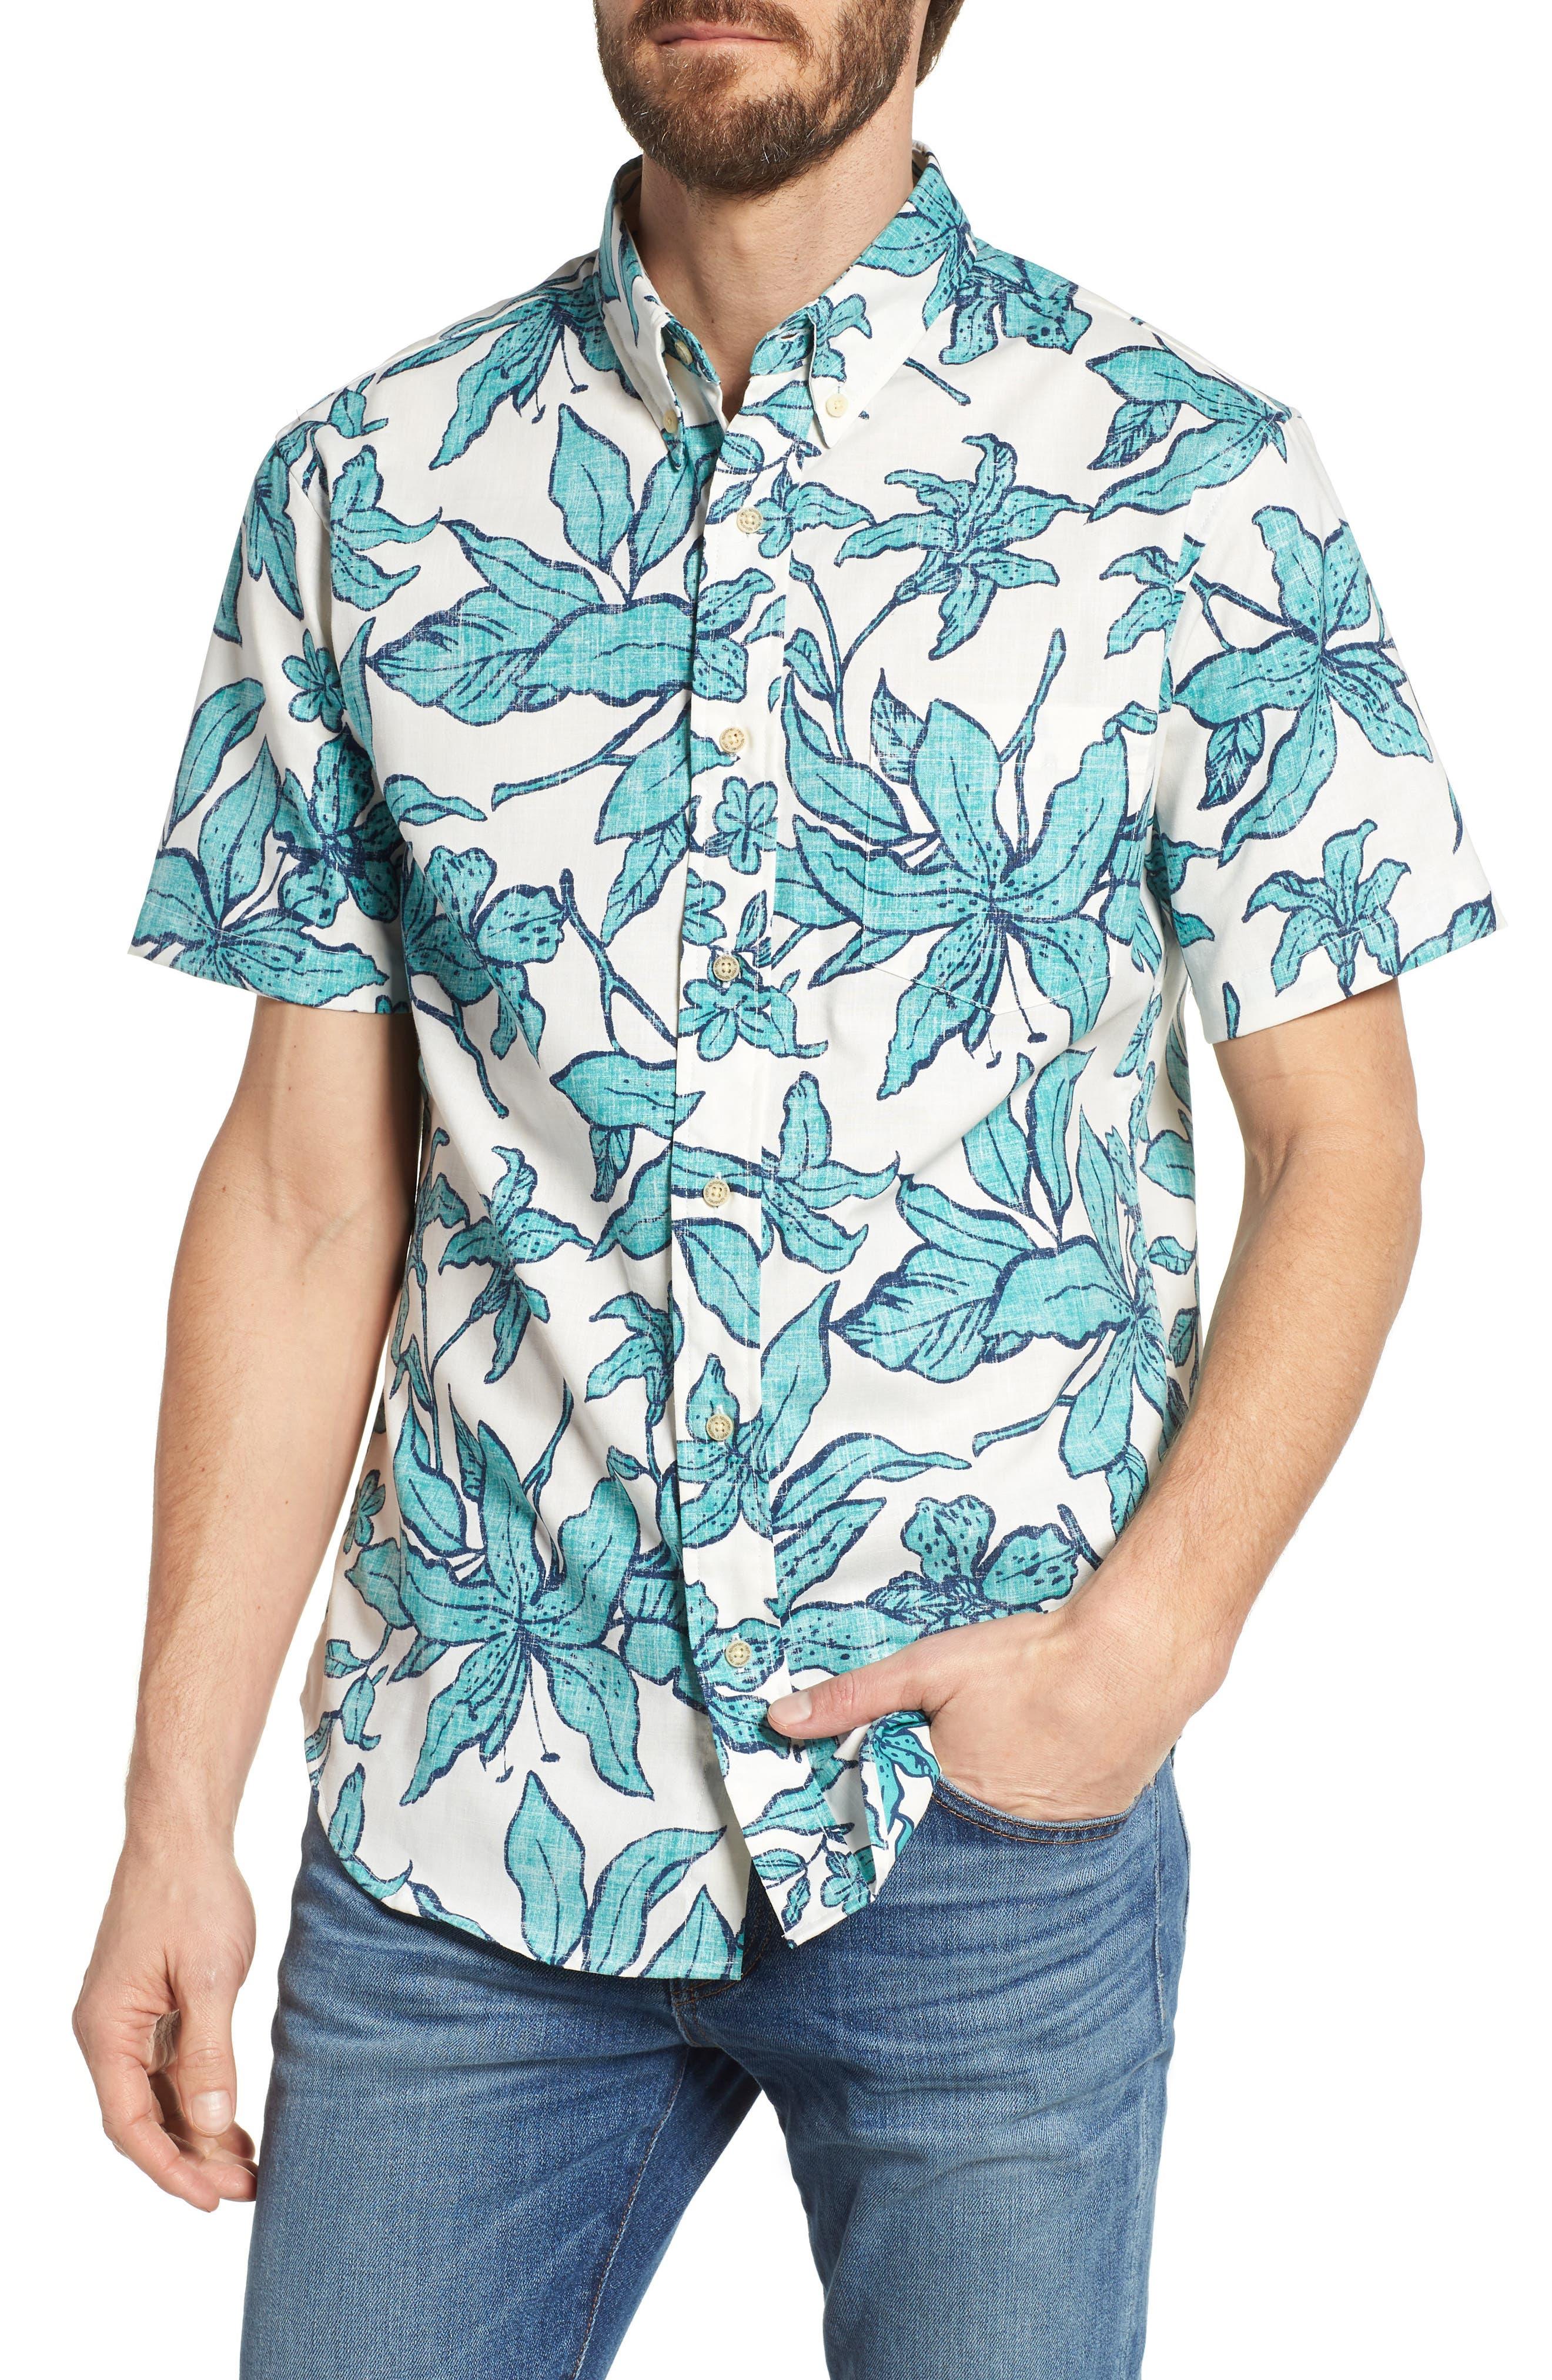 Luhiehu Tailored Fit Print Camp Shirt,                             Main thumbnail 1, color,                             104